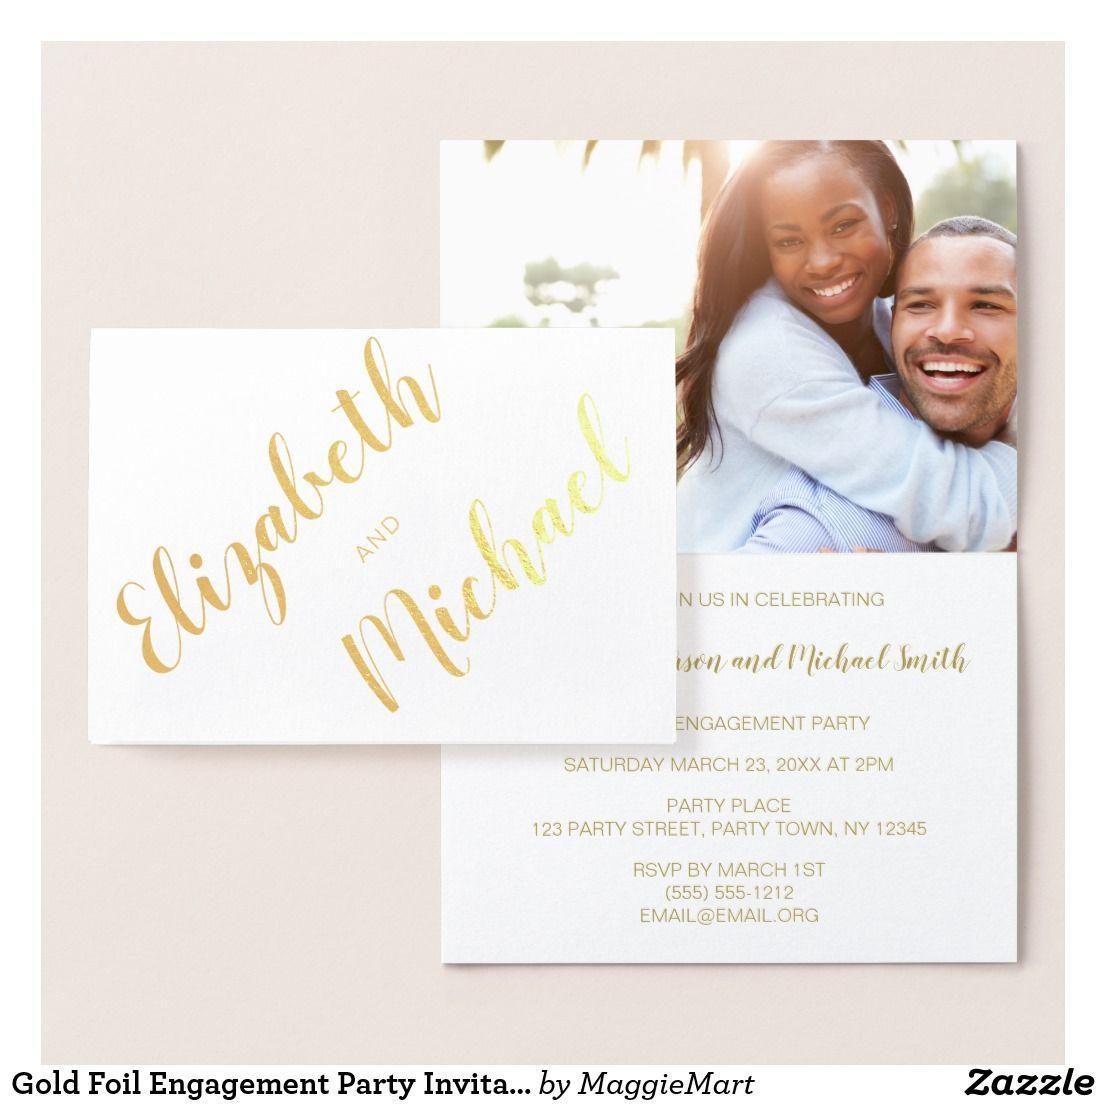 Gold Foil Engagement Party Invitation Photo Names